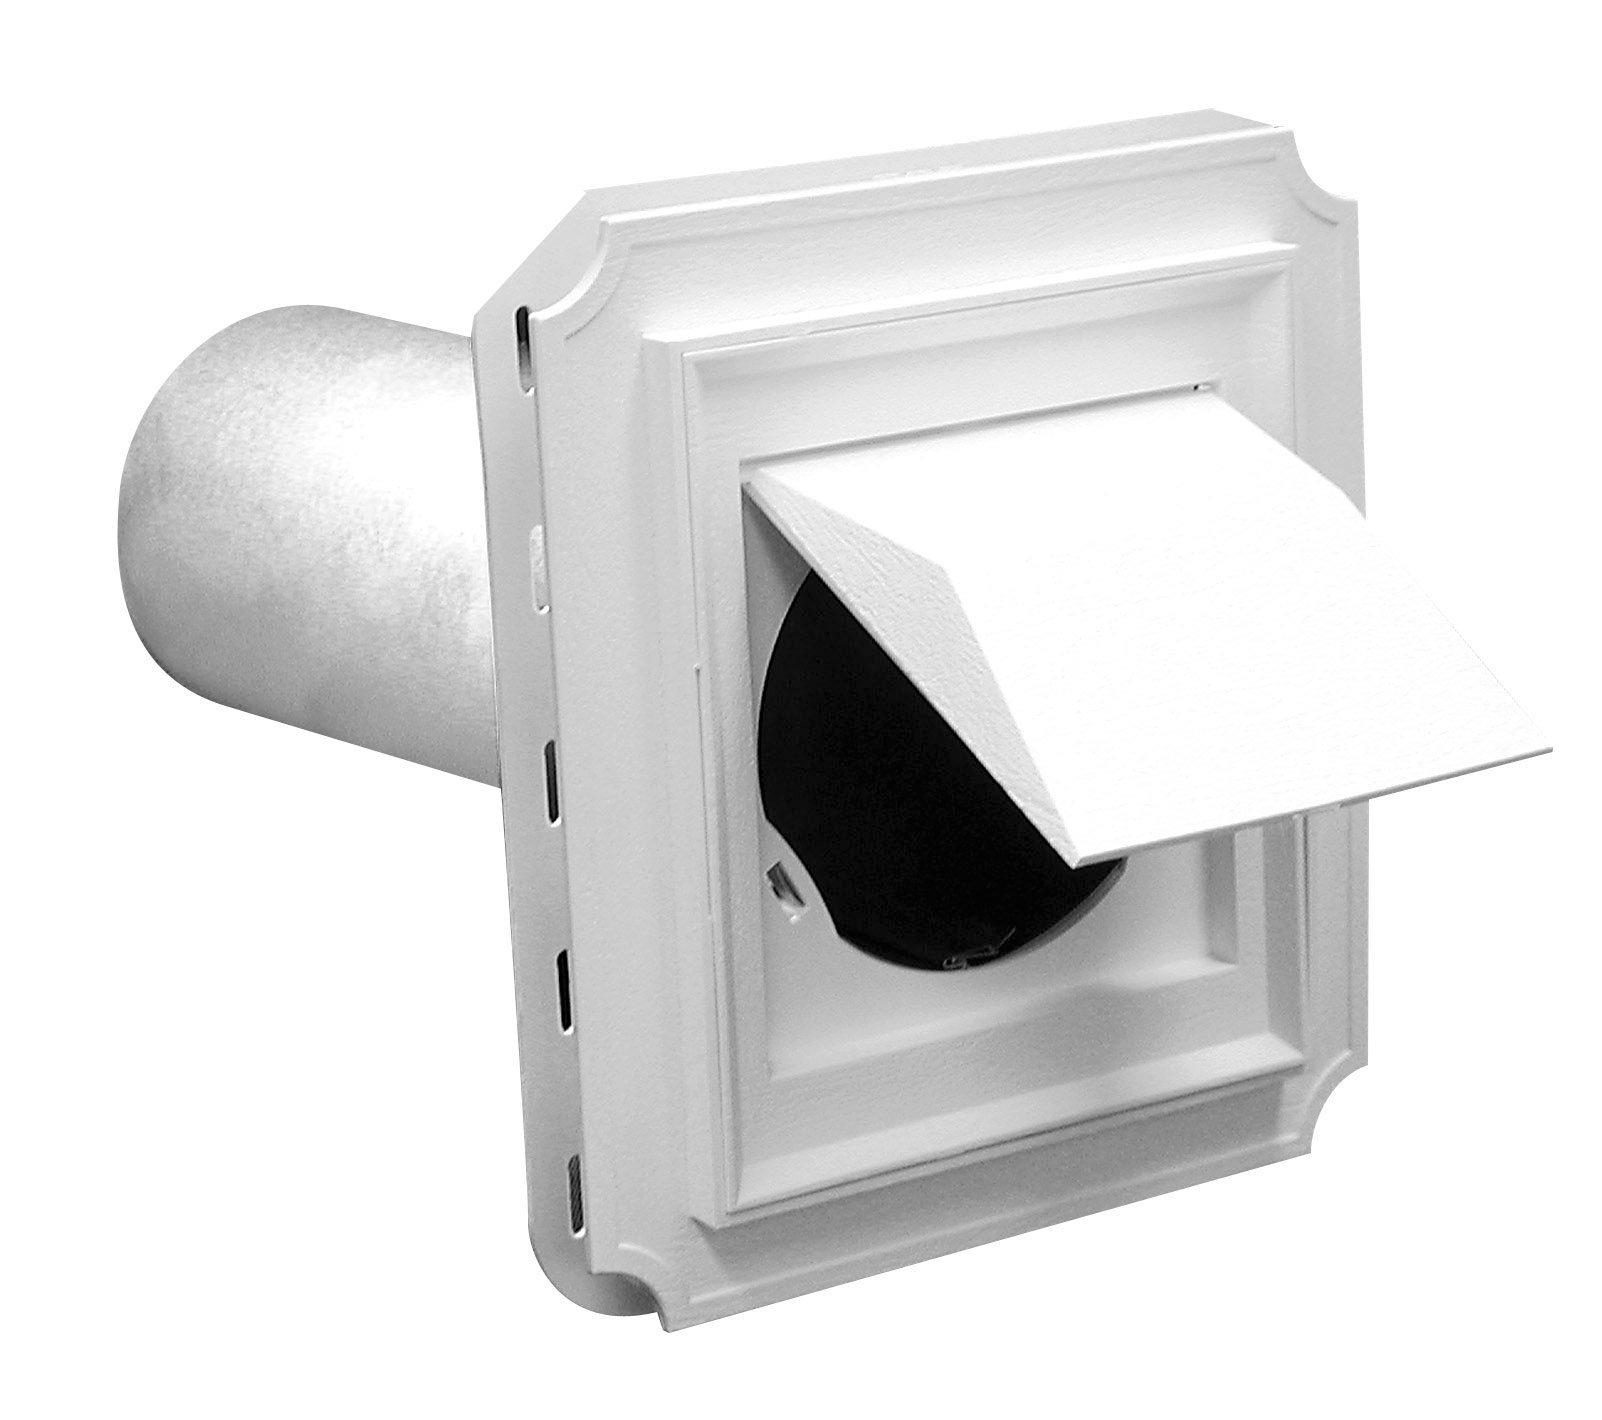 Duraflo 641015-00 Dryer Vent Block, White